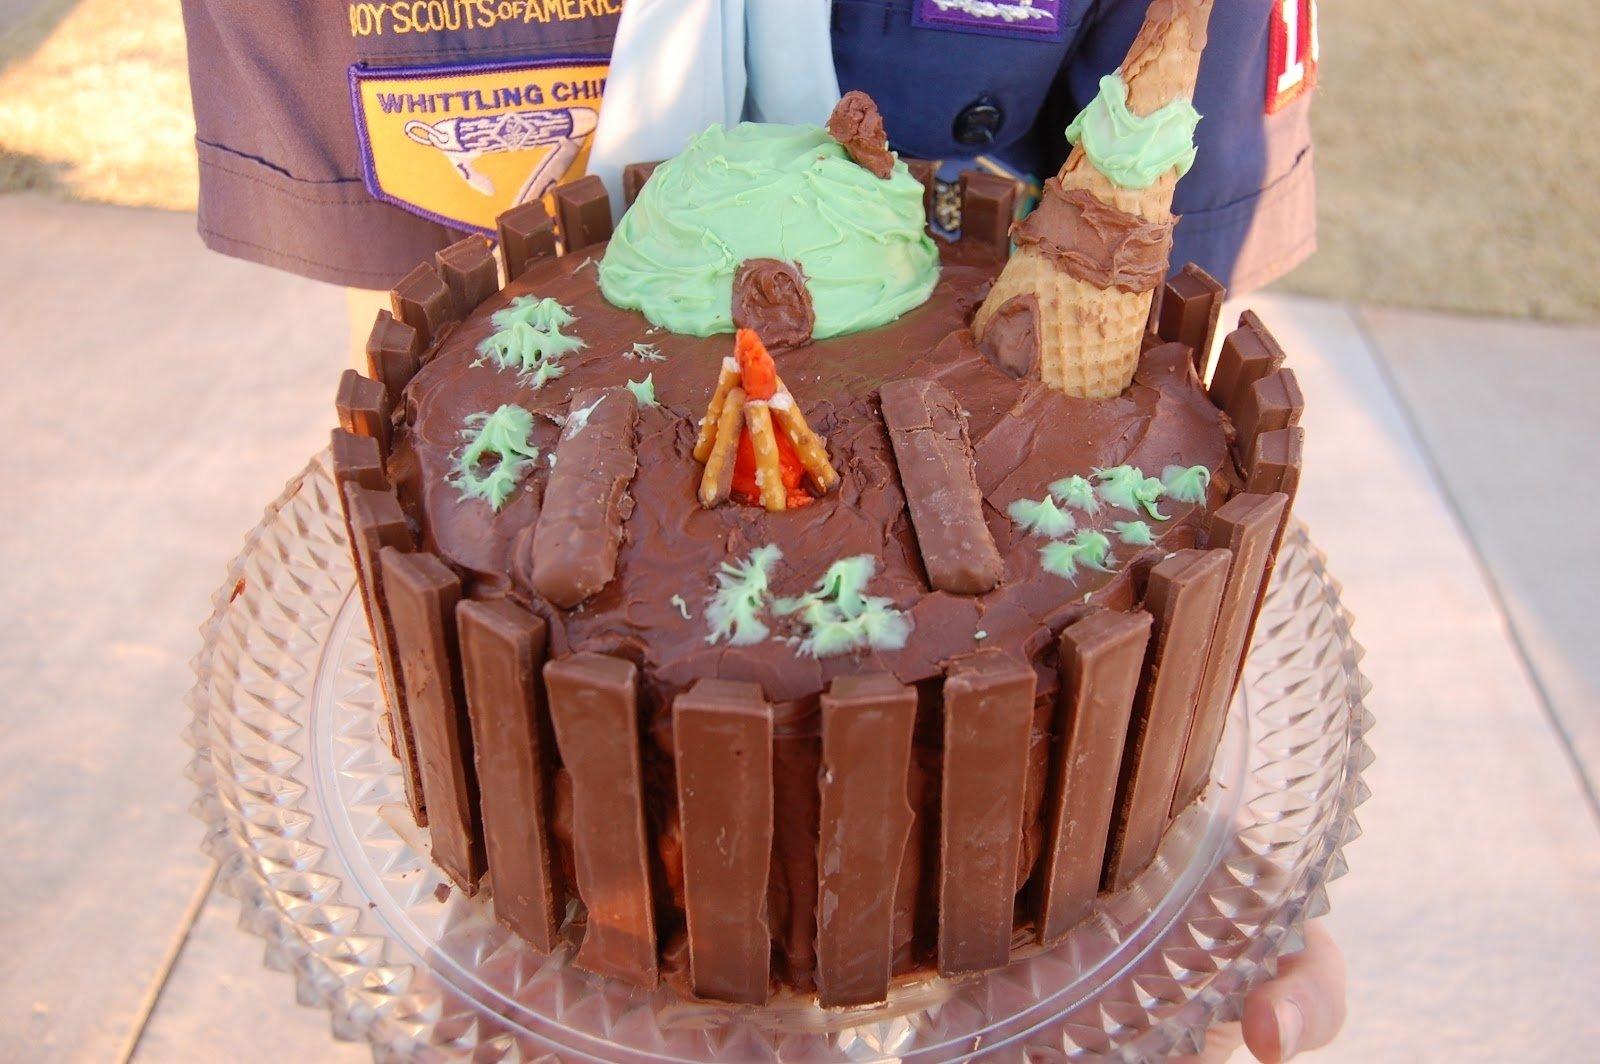 10 Cute Cub Scout Cake Decorating Ideas babblings and more boy scout cake decorating contest 2020